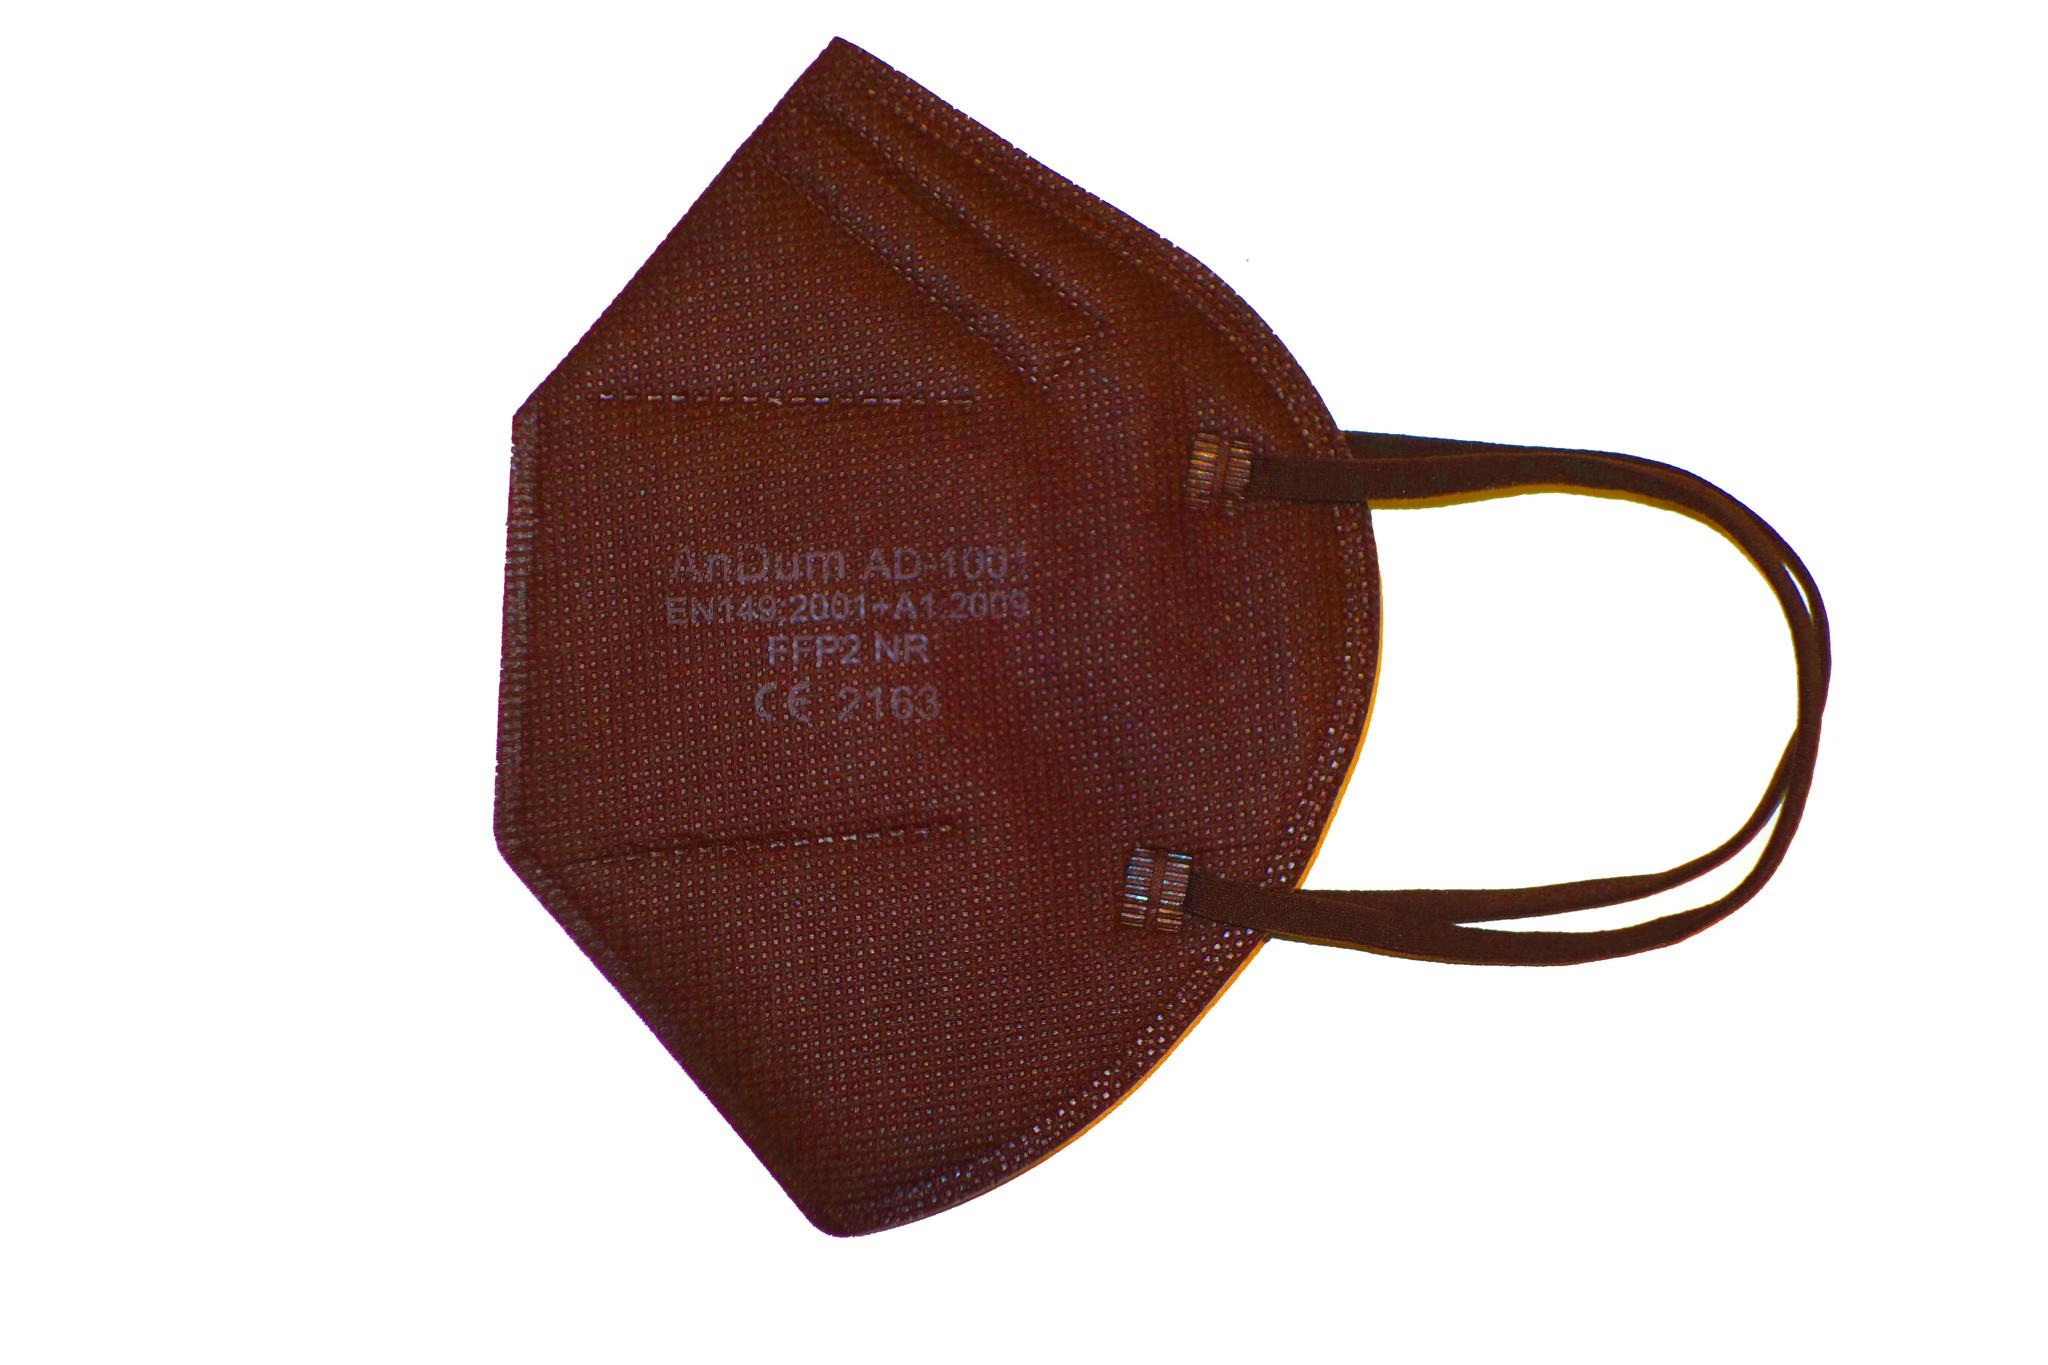 CE zertifizierte bunte FFP2 Maske dunkelbraun schon ab 0,75 € B2B